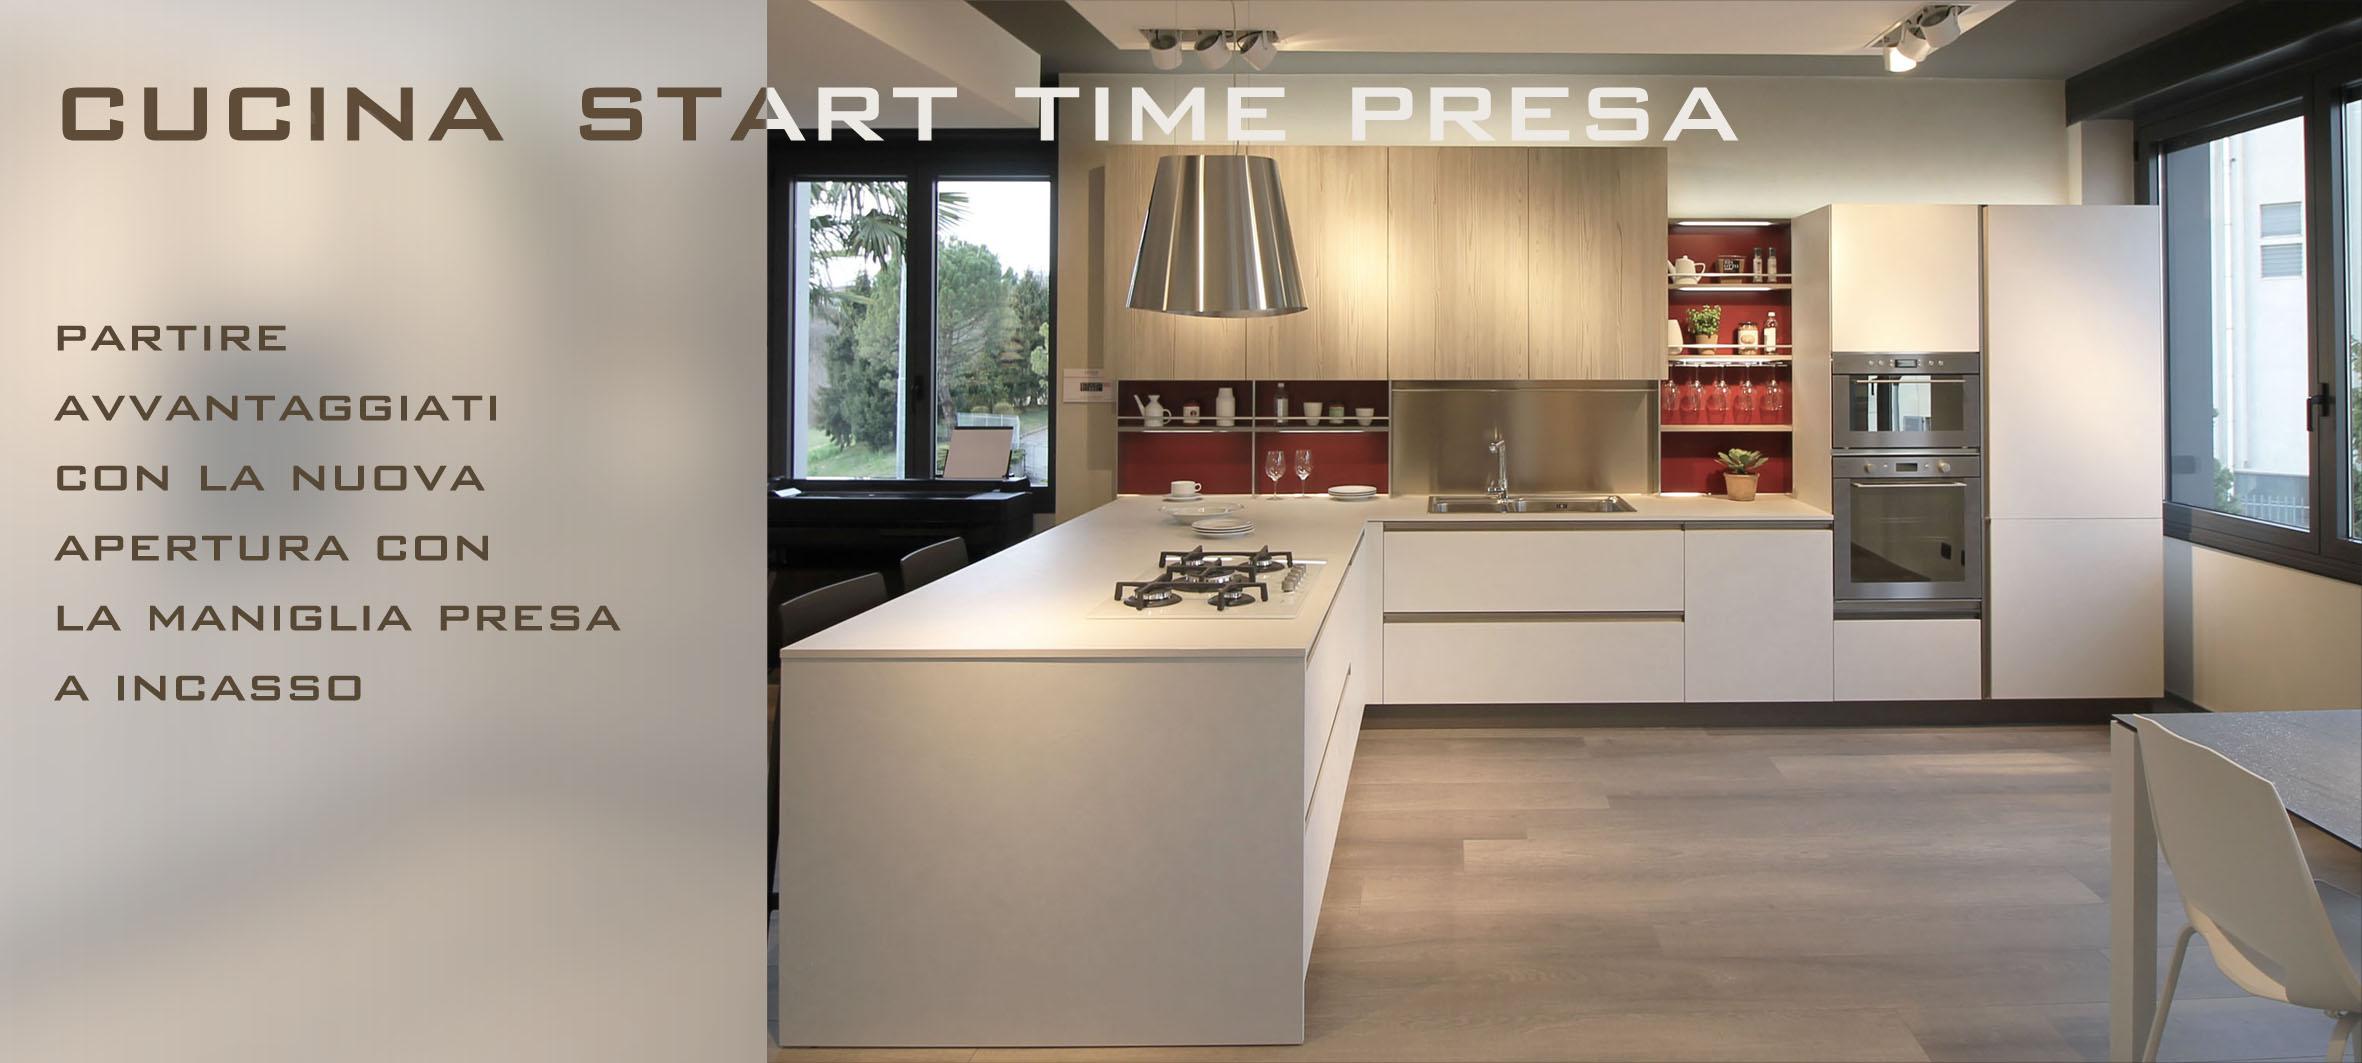 smart_time_presa_nf